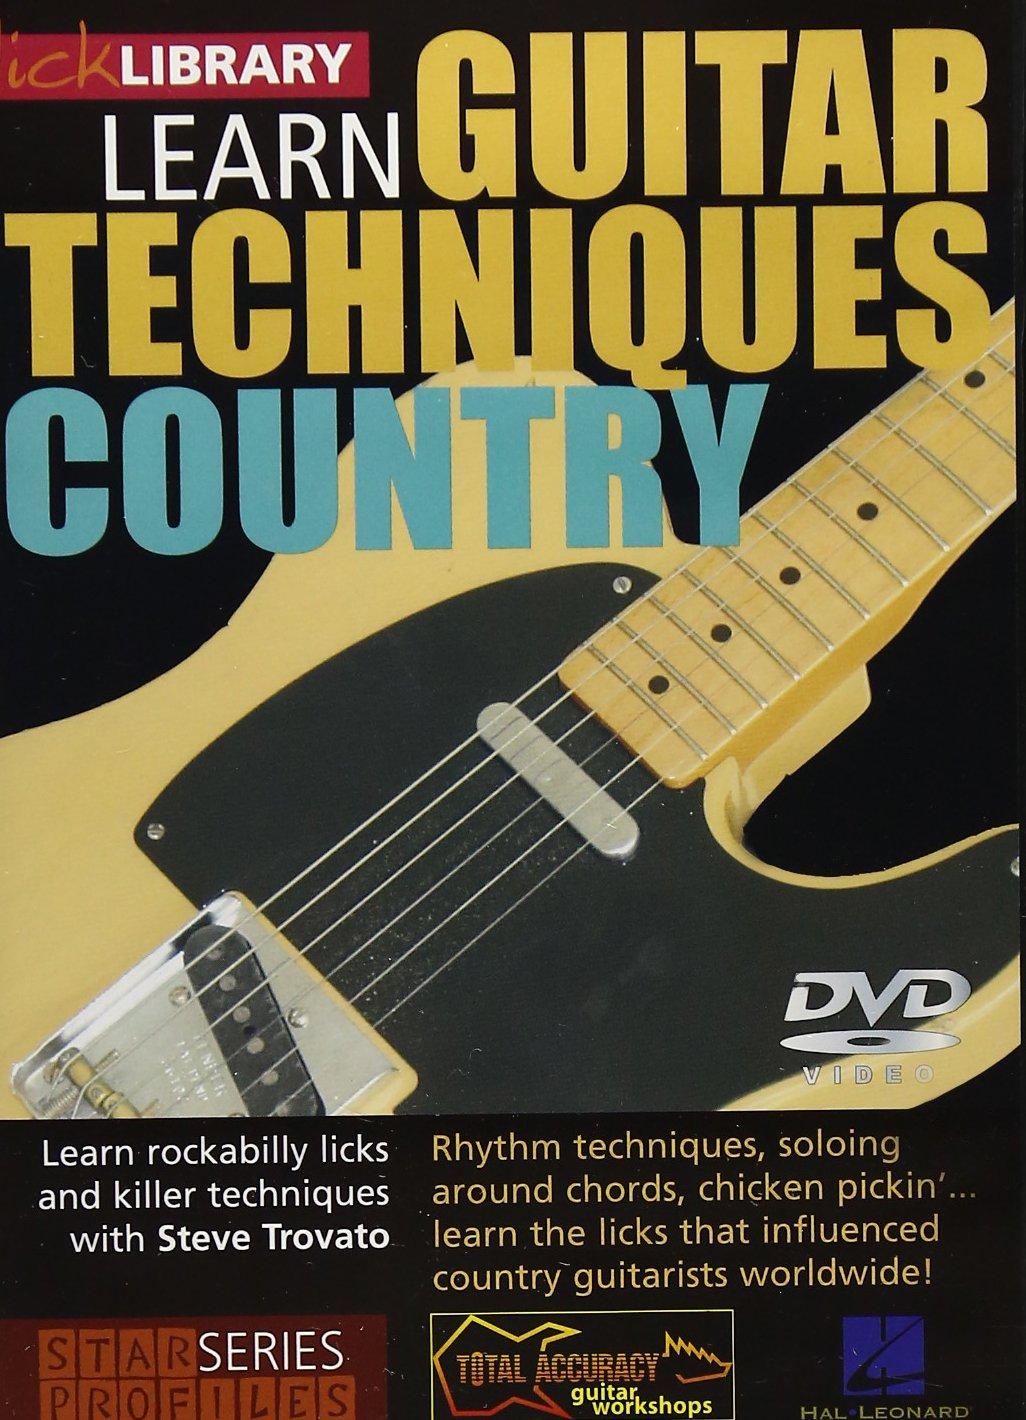 DVD : Steve Trovato - Learn Guitar Techniques: Country Albert Lee Style (DVD)